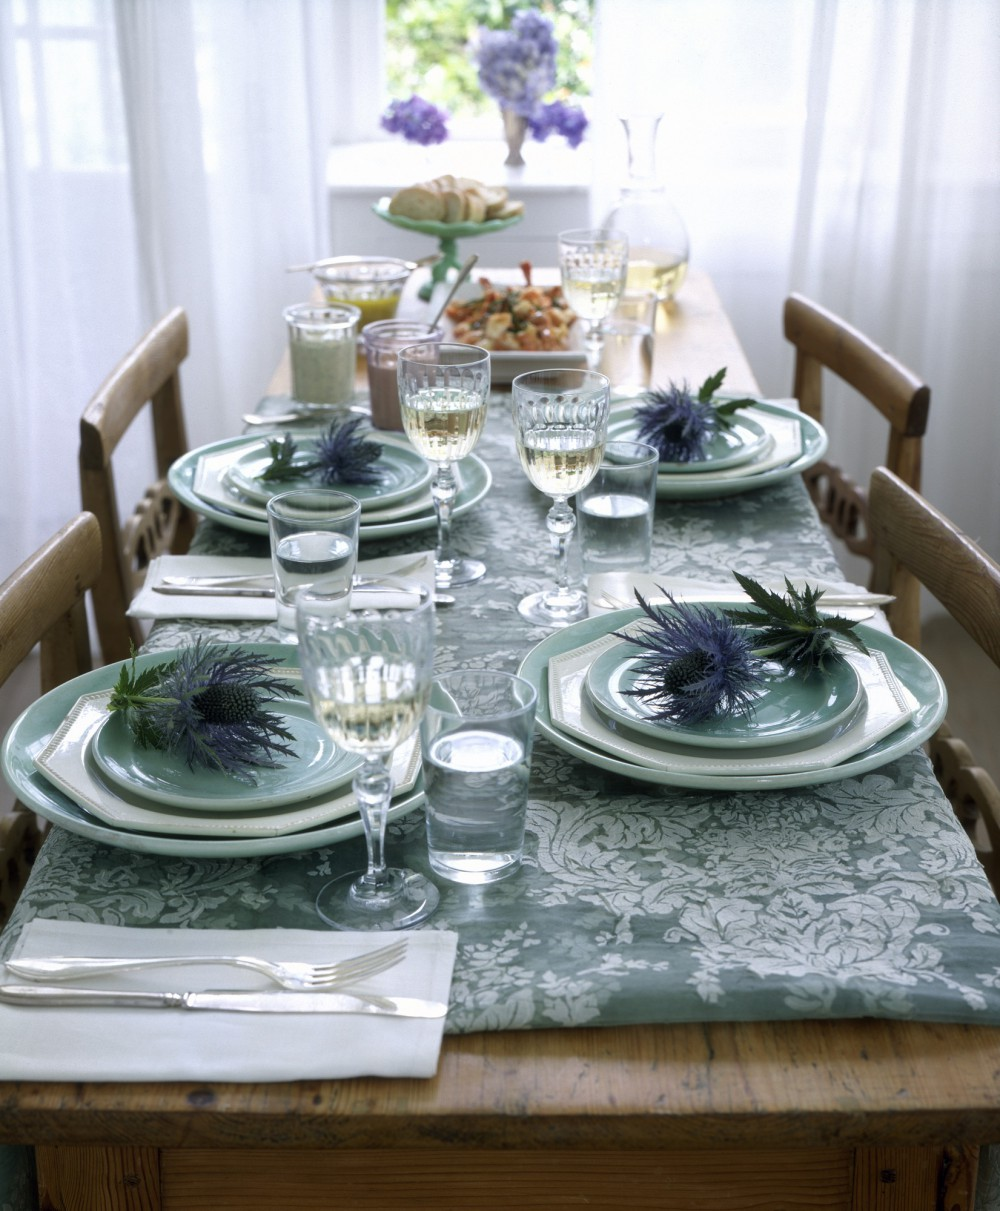 Правила сервировки стола в домашних условиях: 6 шагов и 50 фото